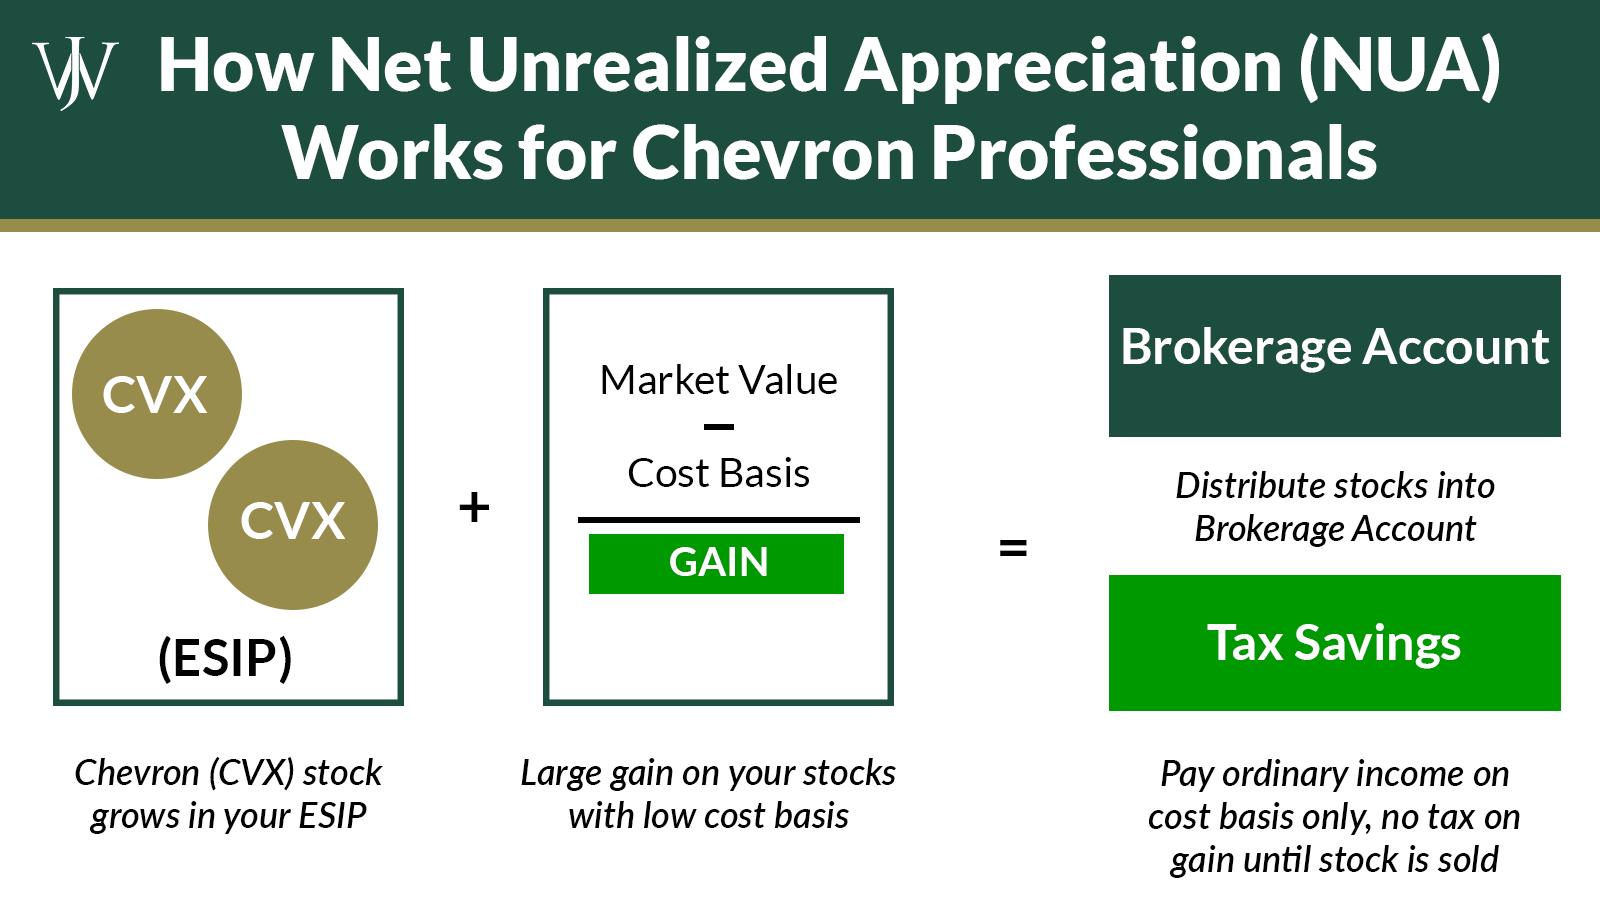 How Chevron Employees Can Use NUA on CVX for Tax Savings